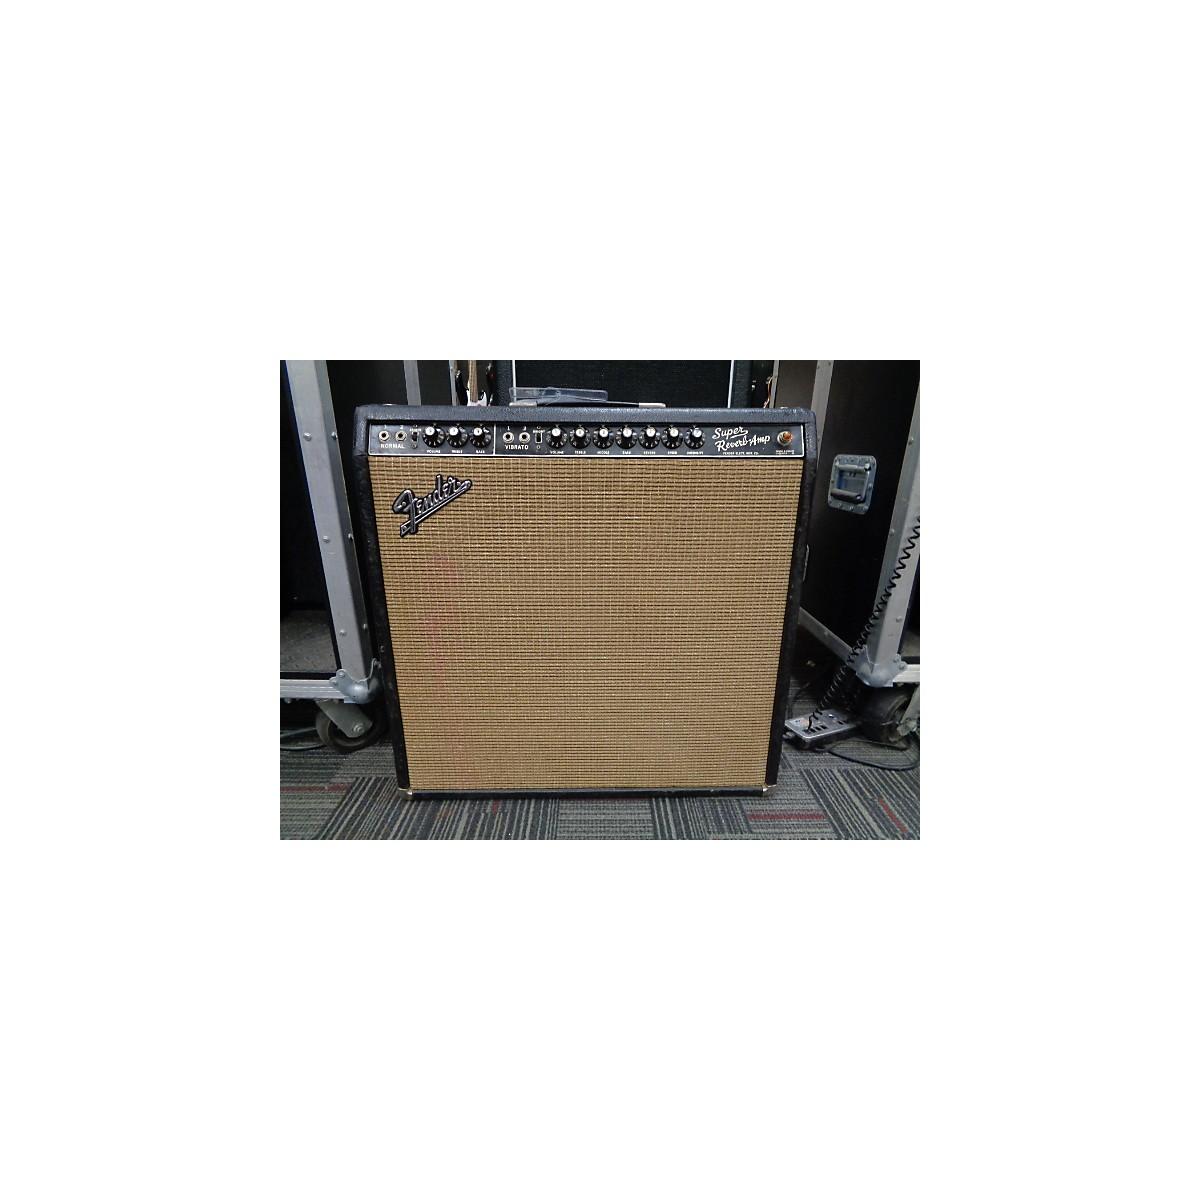 Fender 1964 Super Bassman Tube Guitar Combo Amp